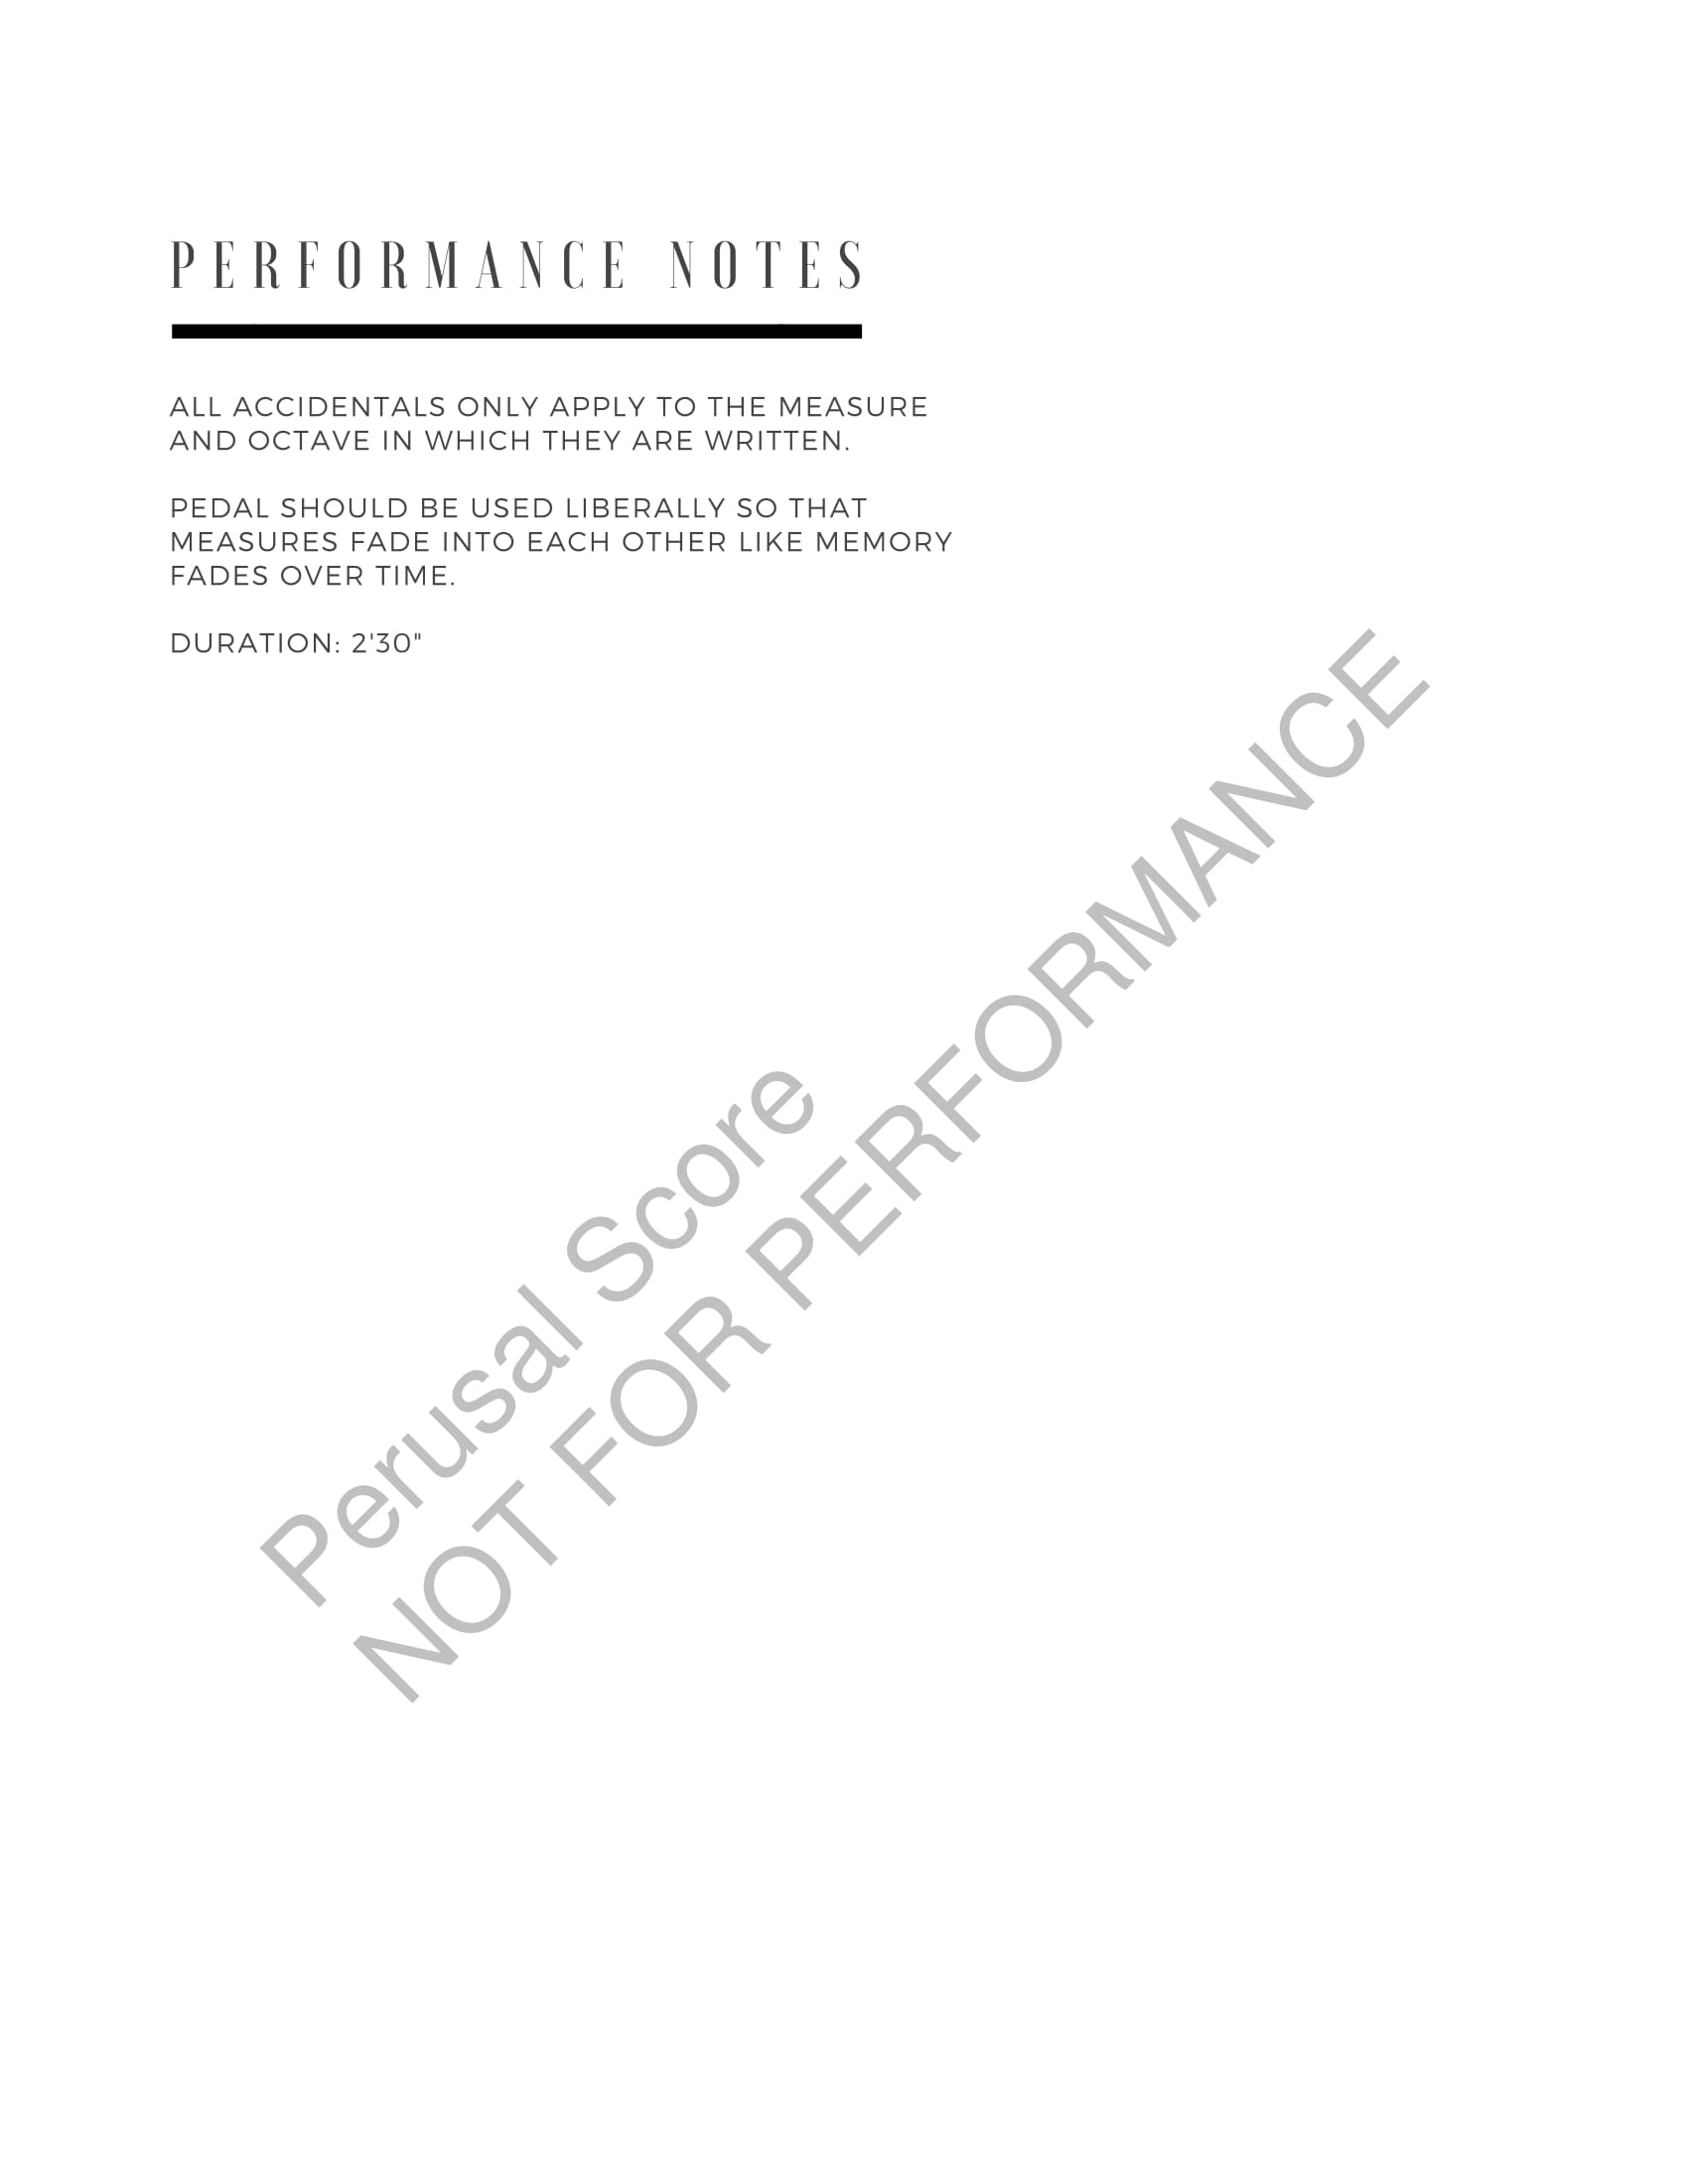 Boyd Lilac Score-watermark-05.jpg